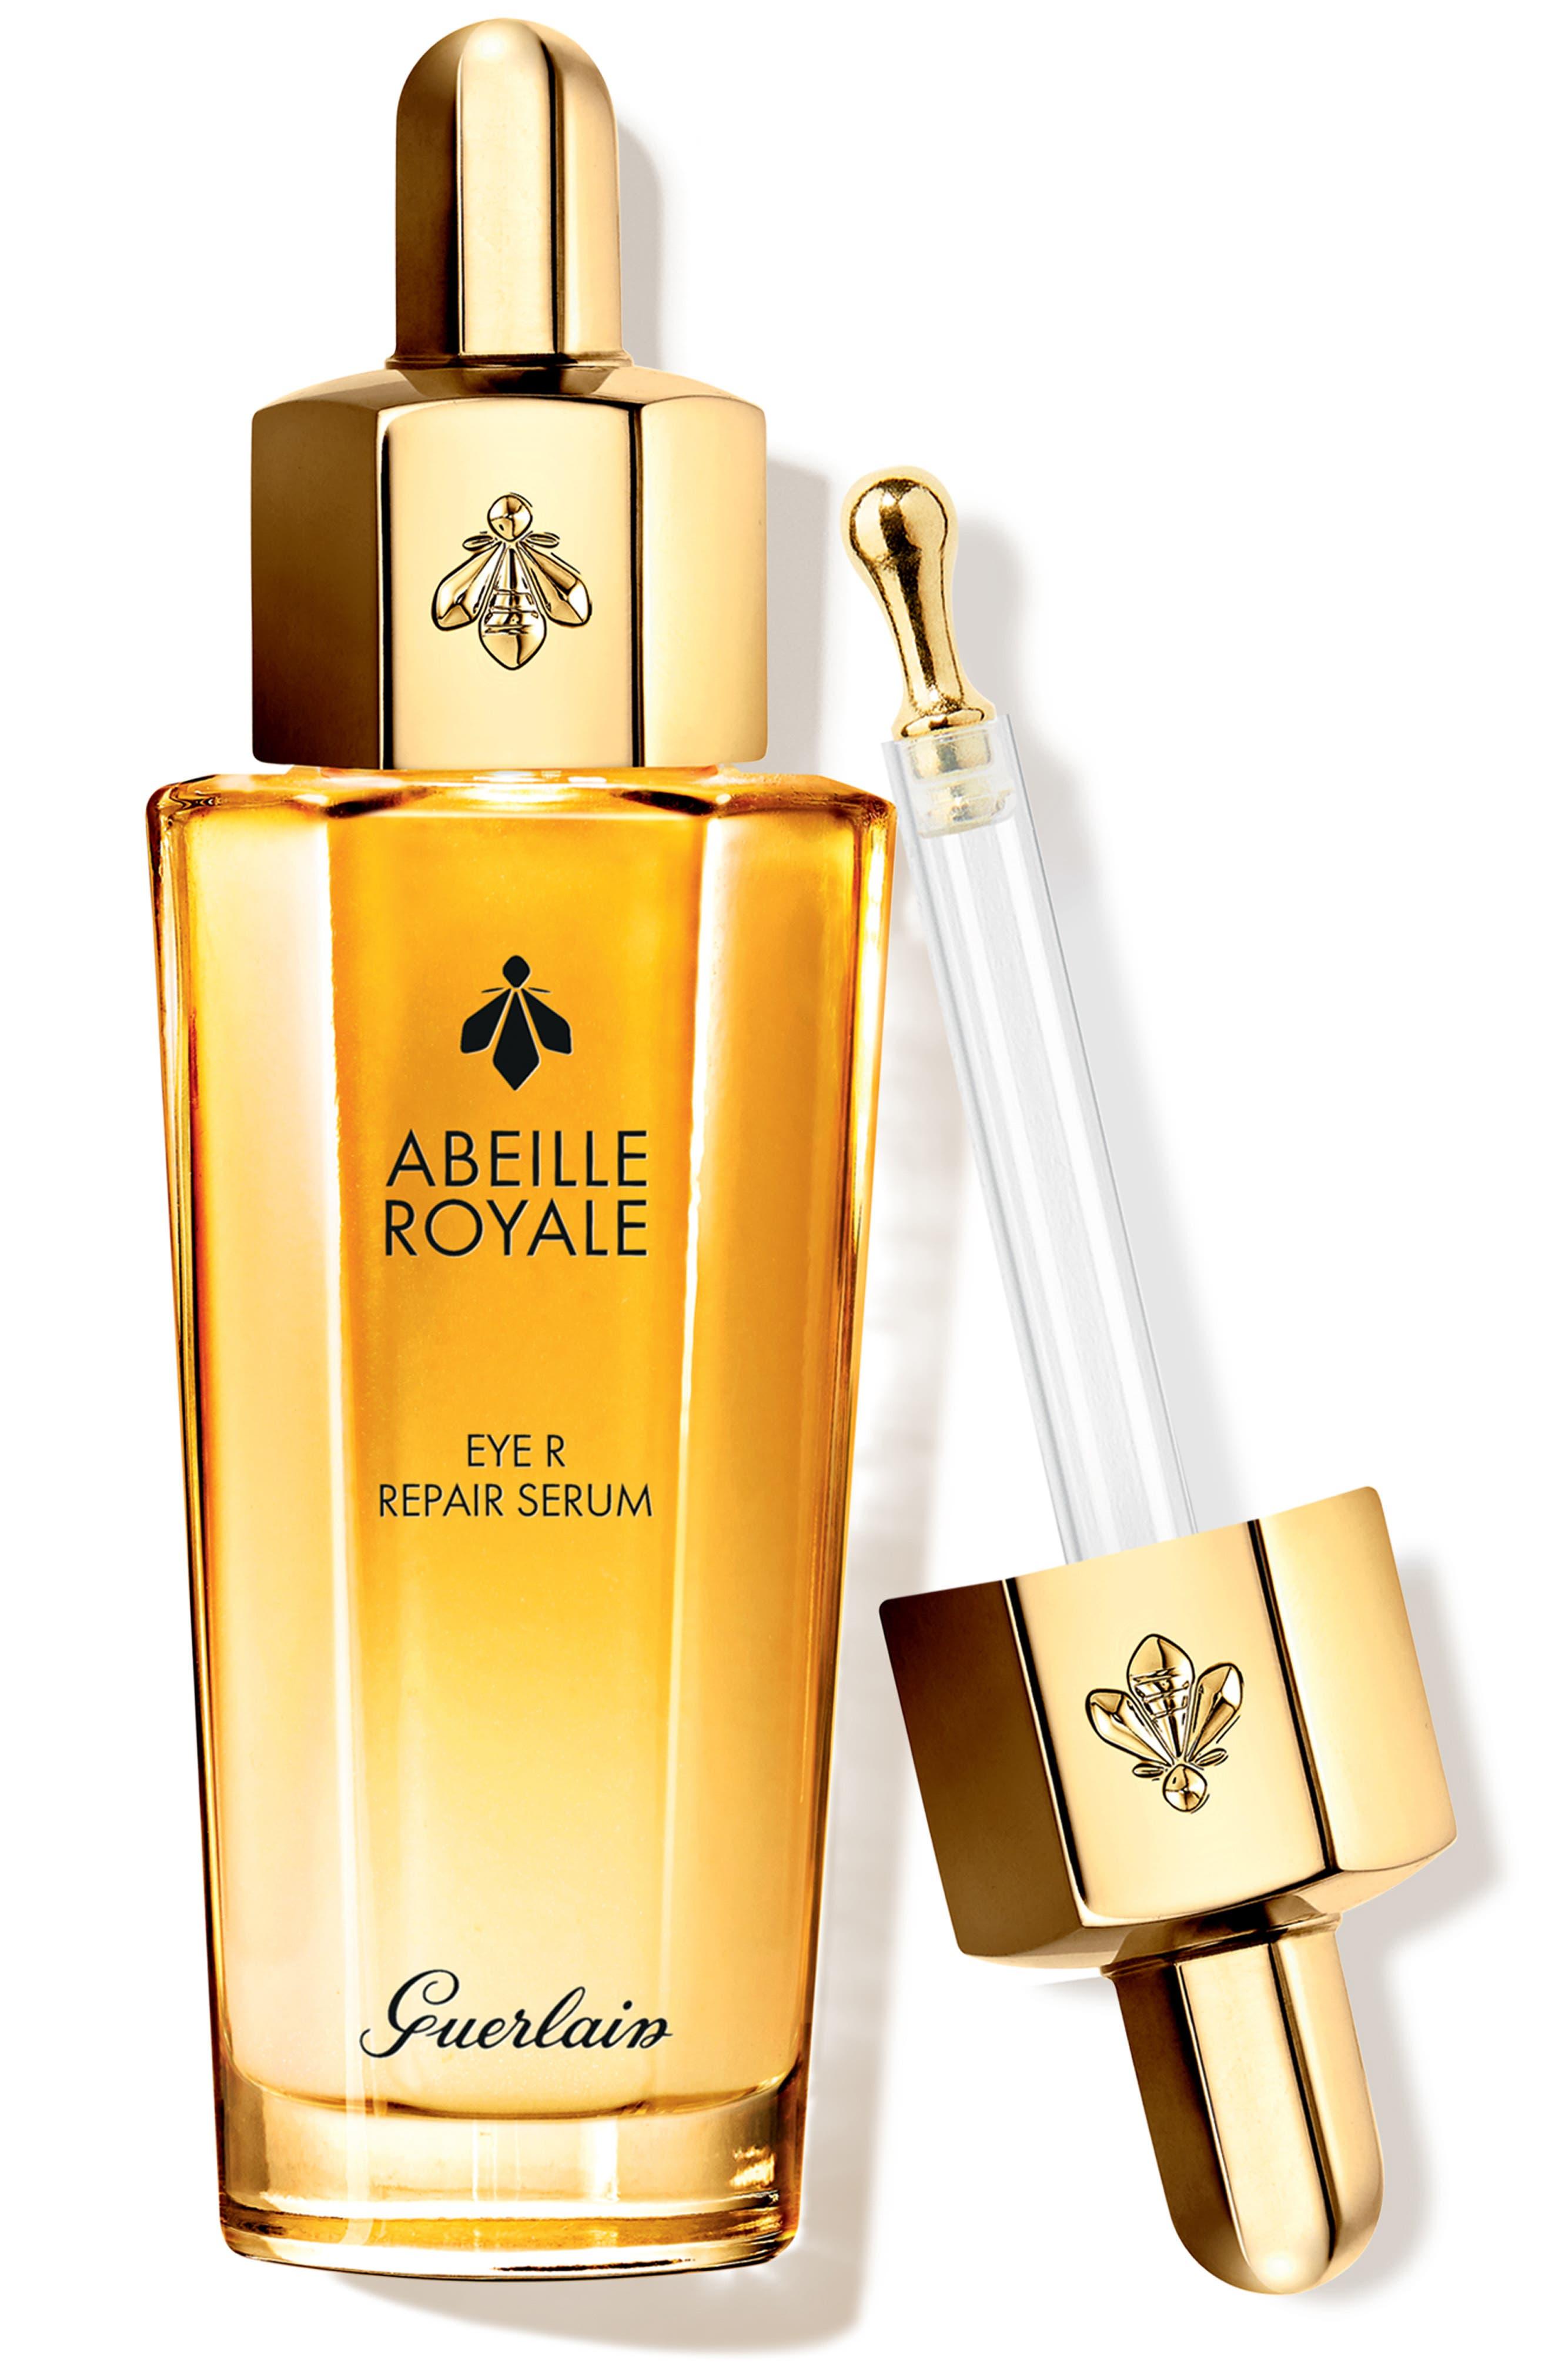 Abeille Royale Anti-Aging Eye R Lifting Serum (Nordstrom Exclusive)